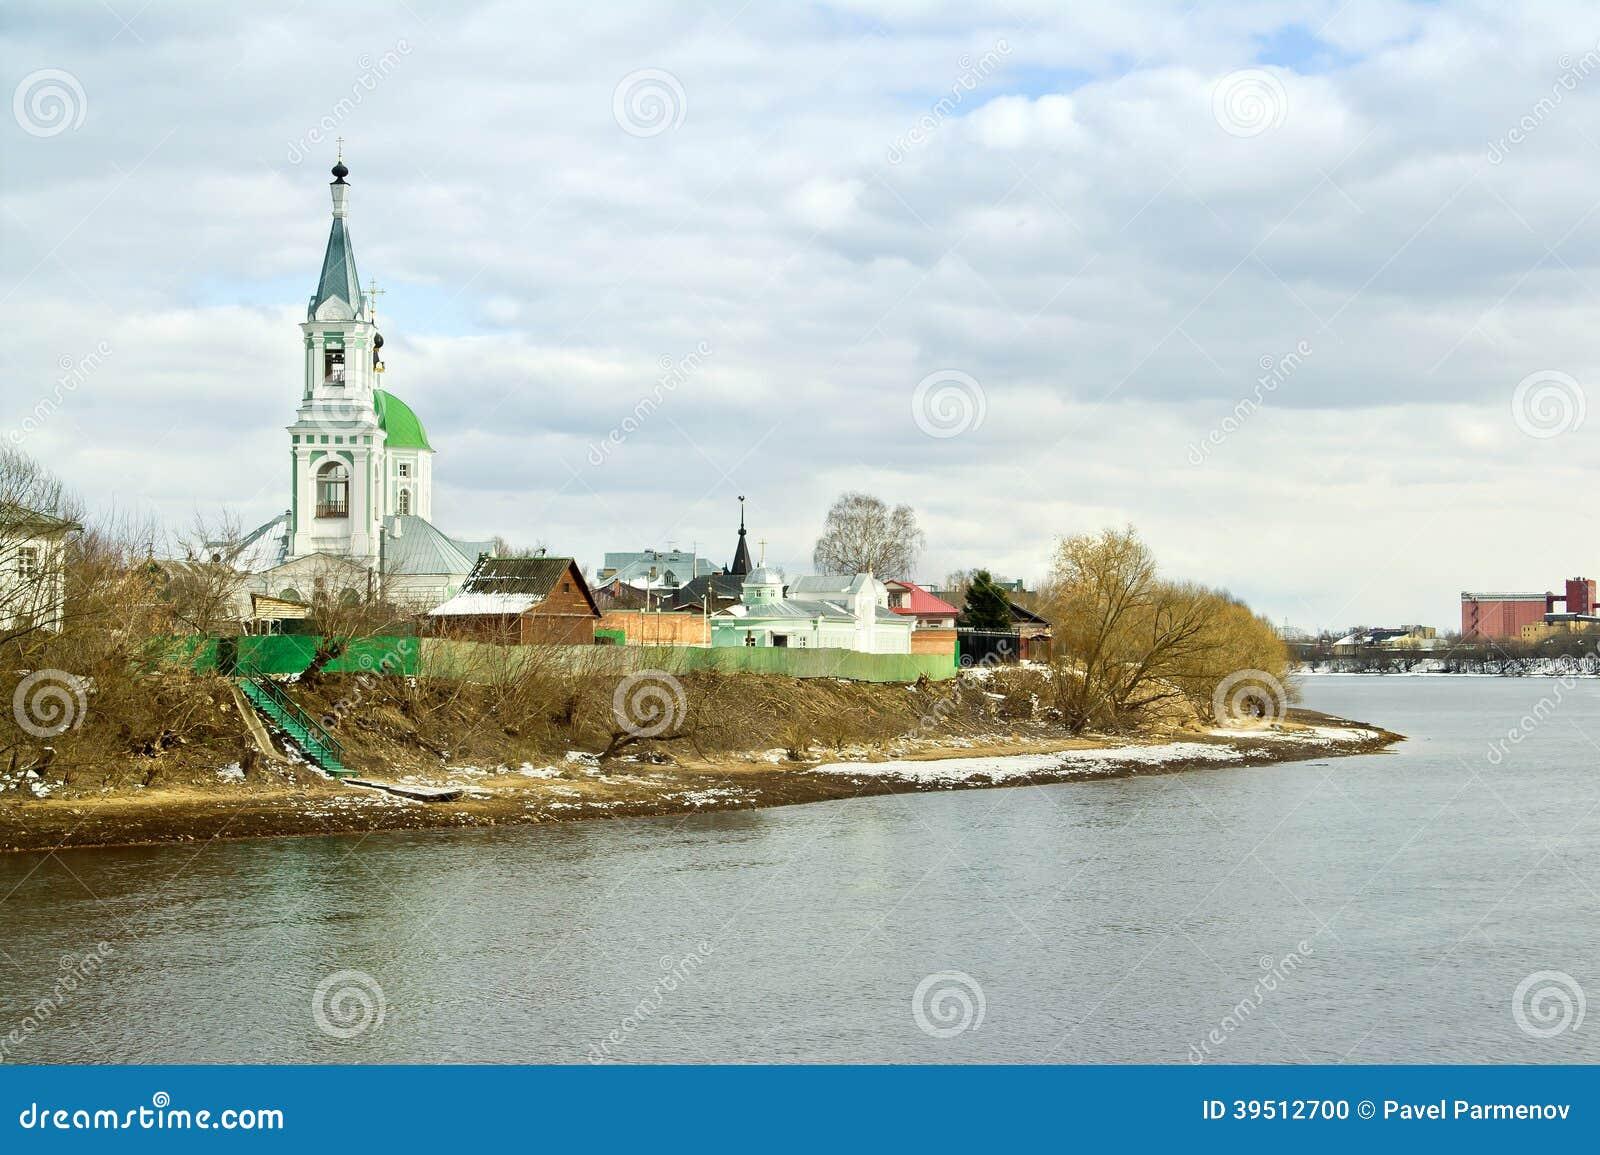 Tver. Convento de monjas de Catherine. Iglesia de Catherine